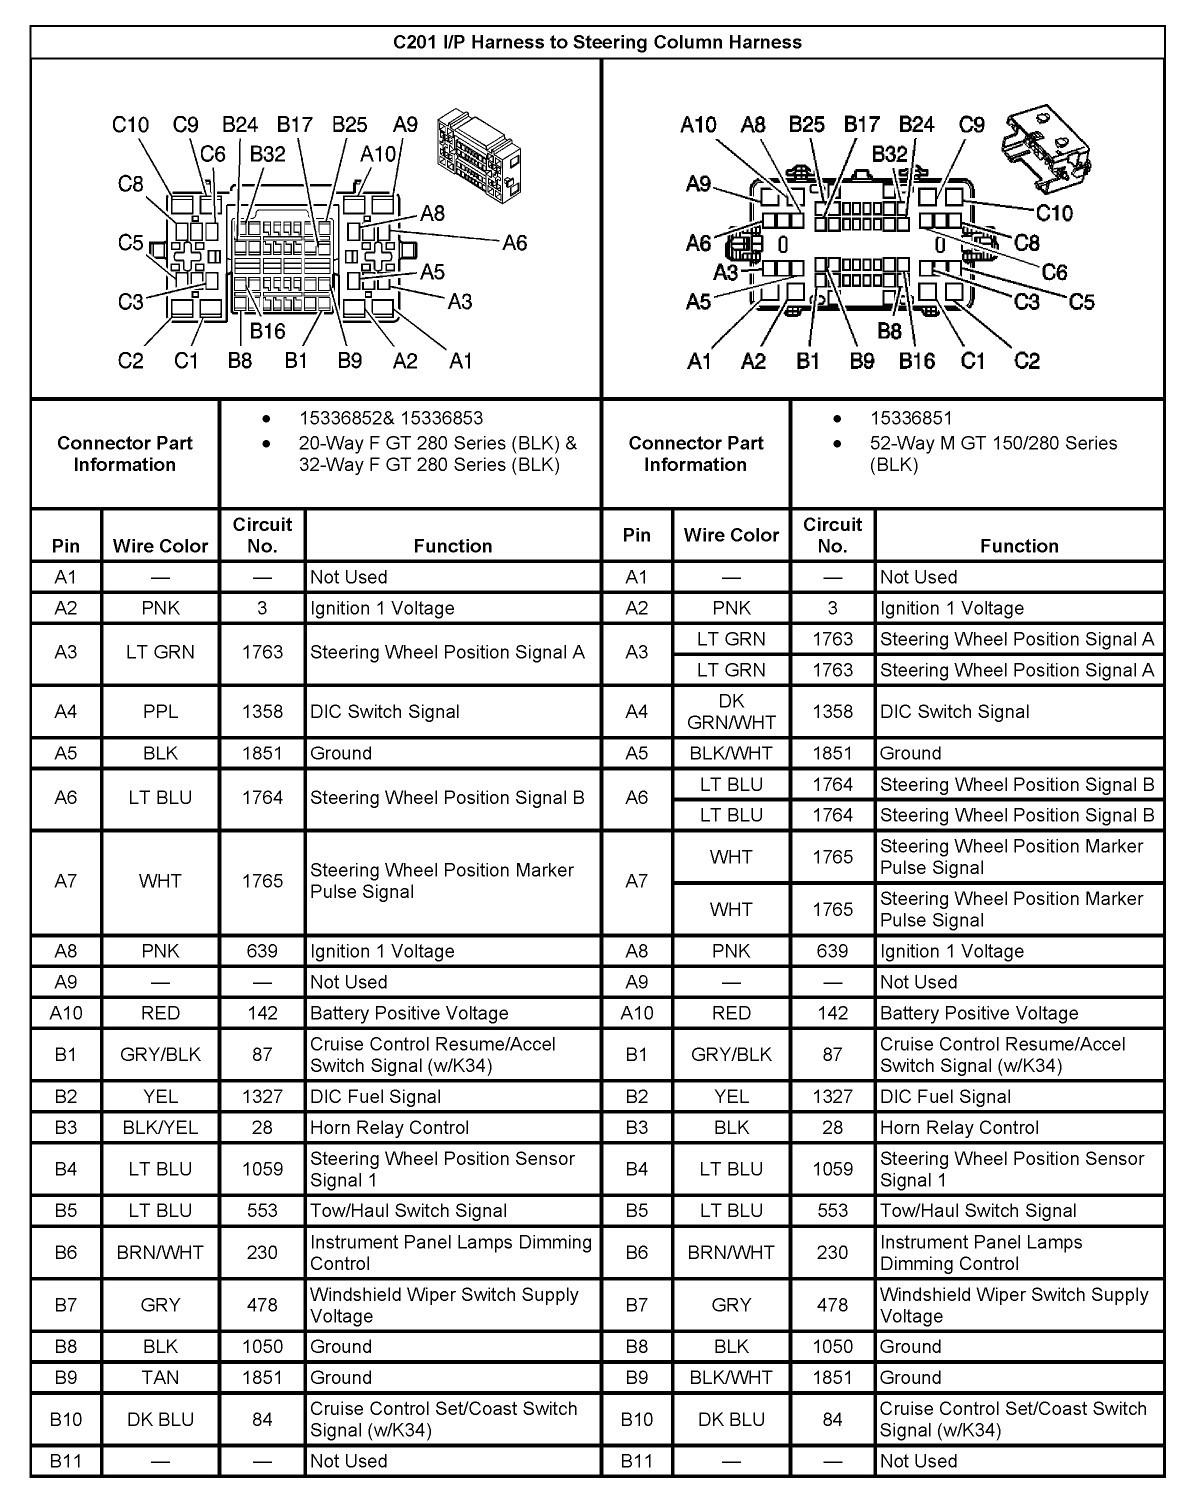 2002 s10 stereo wiring diagram 2002 chevy trailblazer 4x4 wiring rh banyan palace 2009 trailblazer stereo wiring diagram 2009 trailblazer stereo wiring